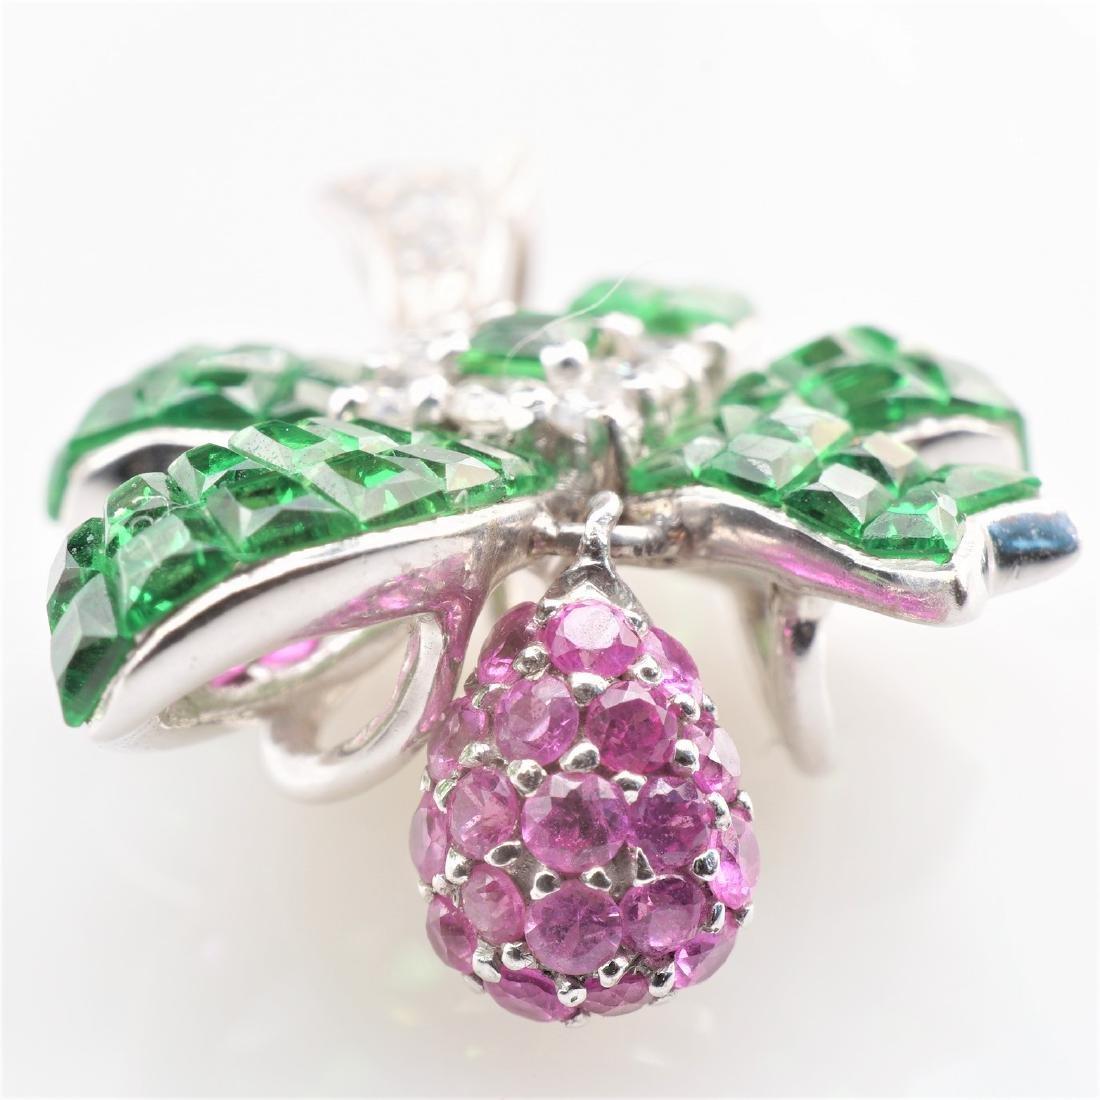 18K WG Emerald, Diamond & Pink Spinel Pendant